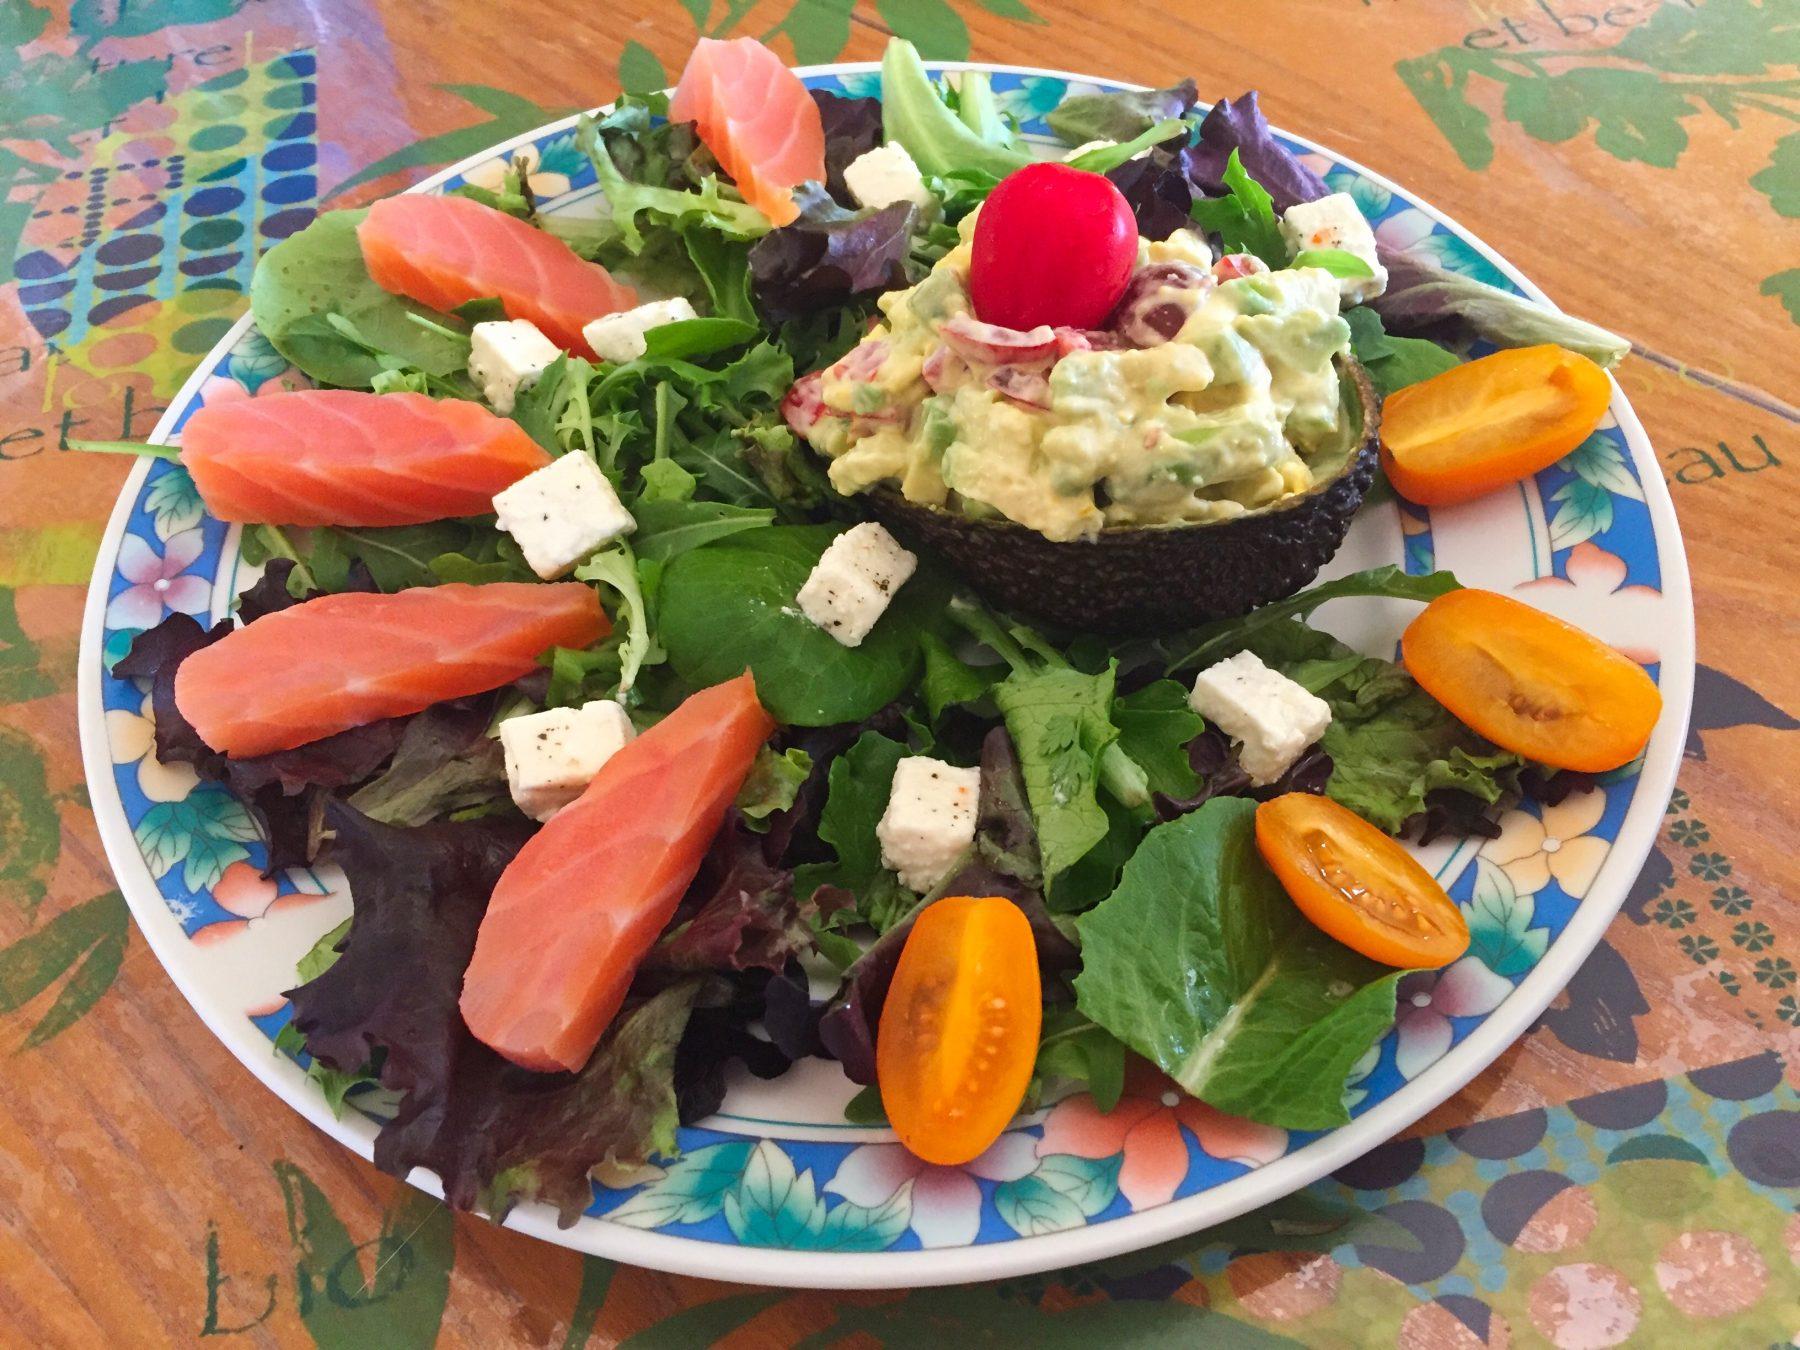 IMG 3771 - Avocat mimosa, salade et saumon fumé